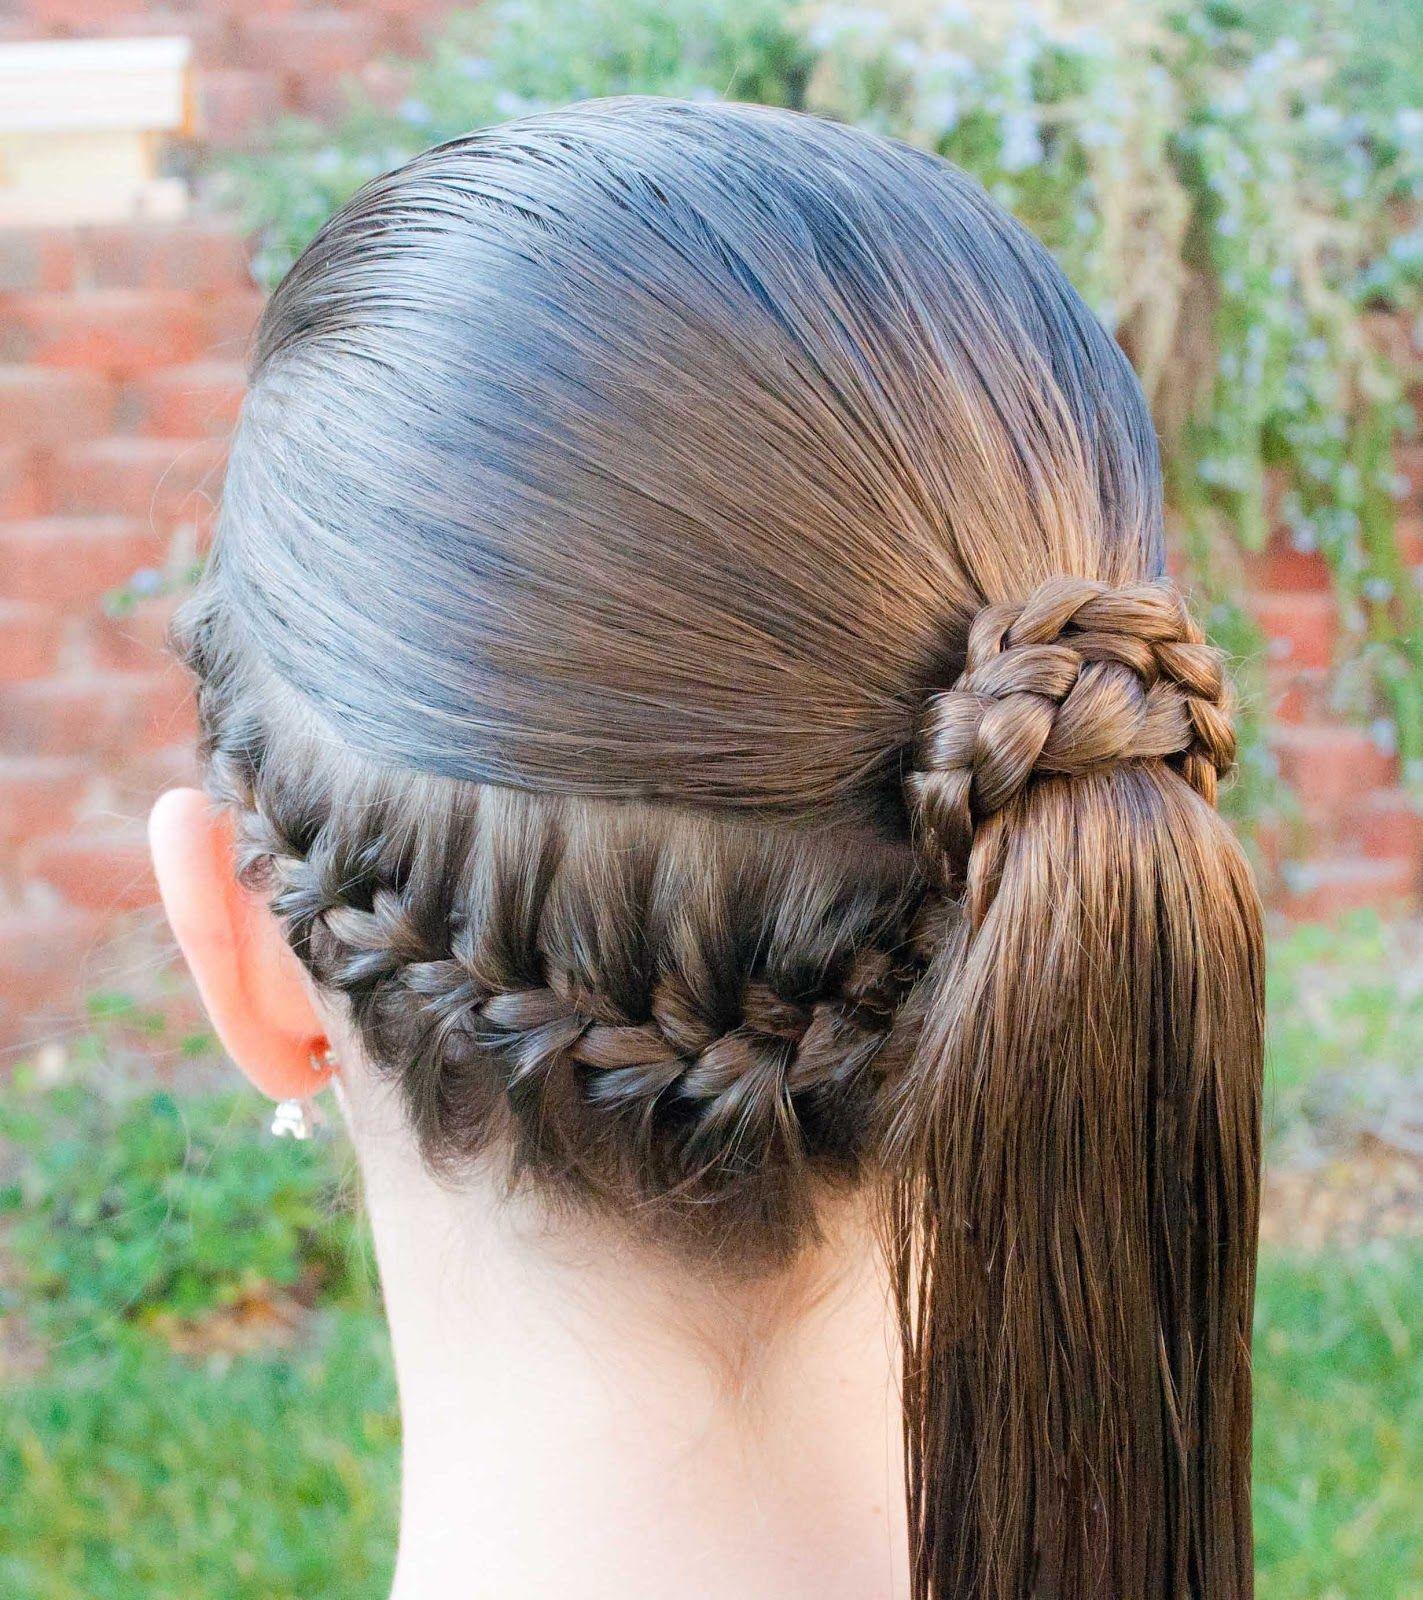 Cocuk Saci Orgu Modelleri Peinados Con Trenzas Peinados Escolares Peinados Bonitos